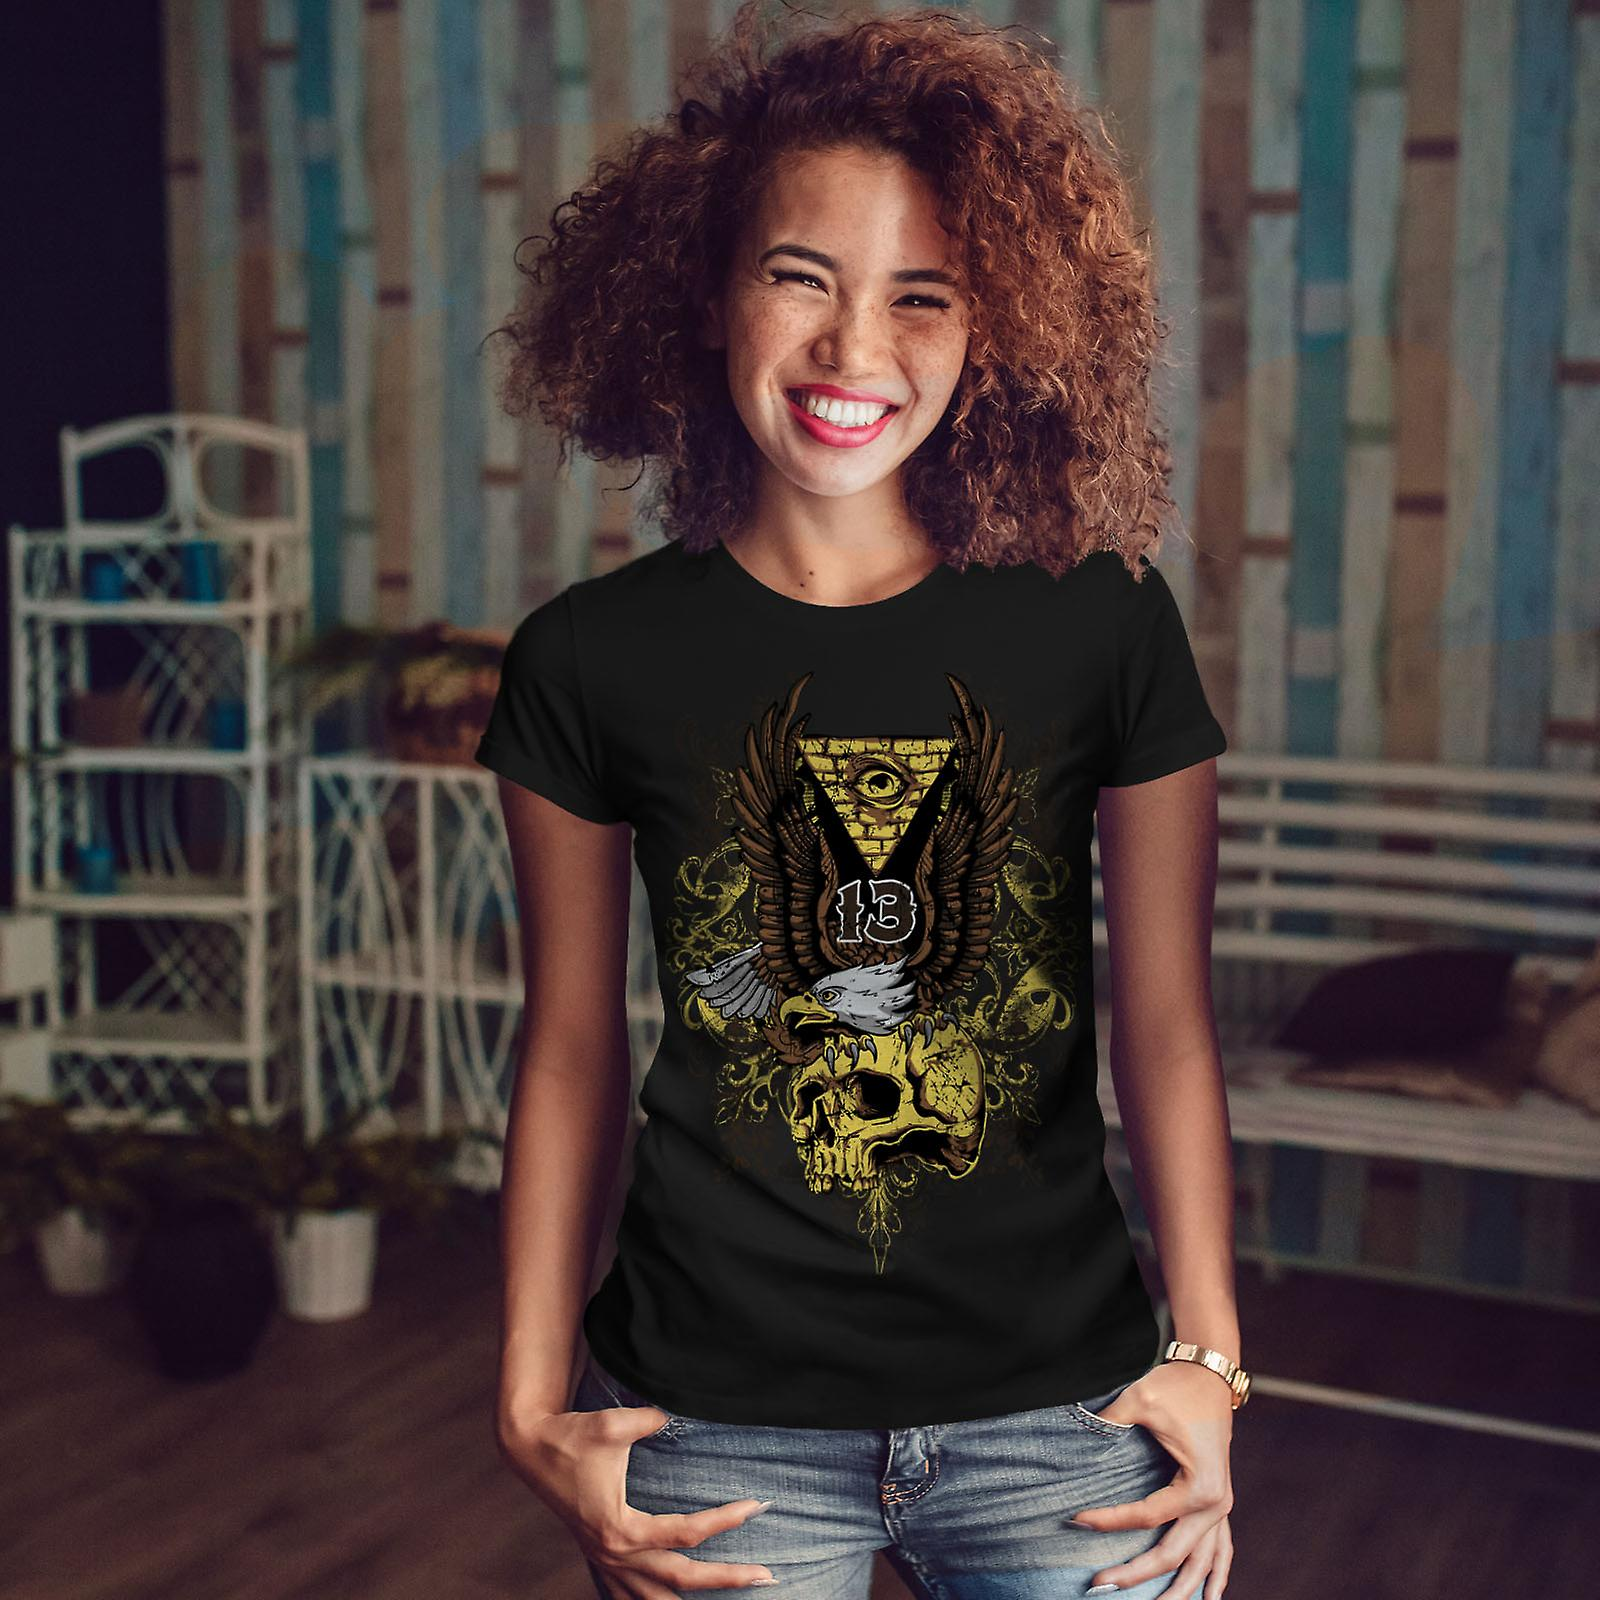 Illuminati örn skalle kvinnor BlackT-skjorta | Wellcoda